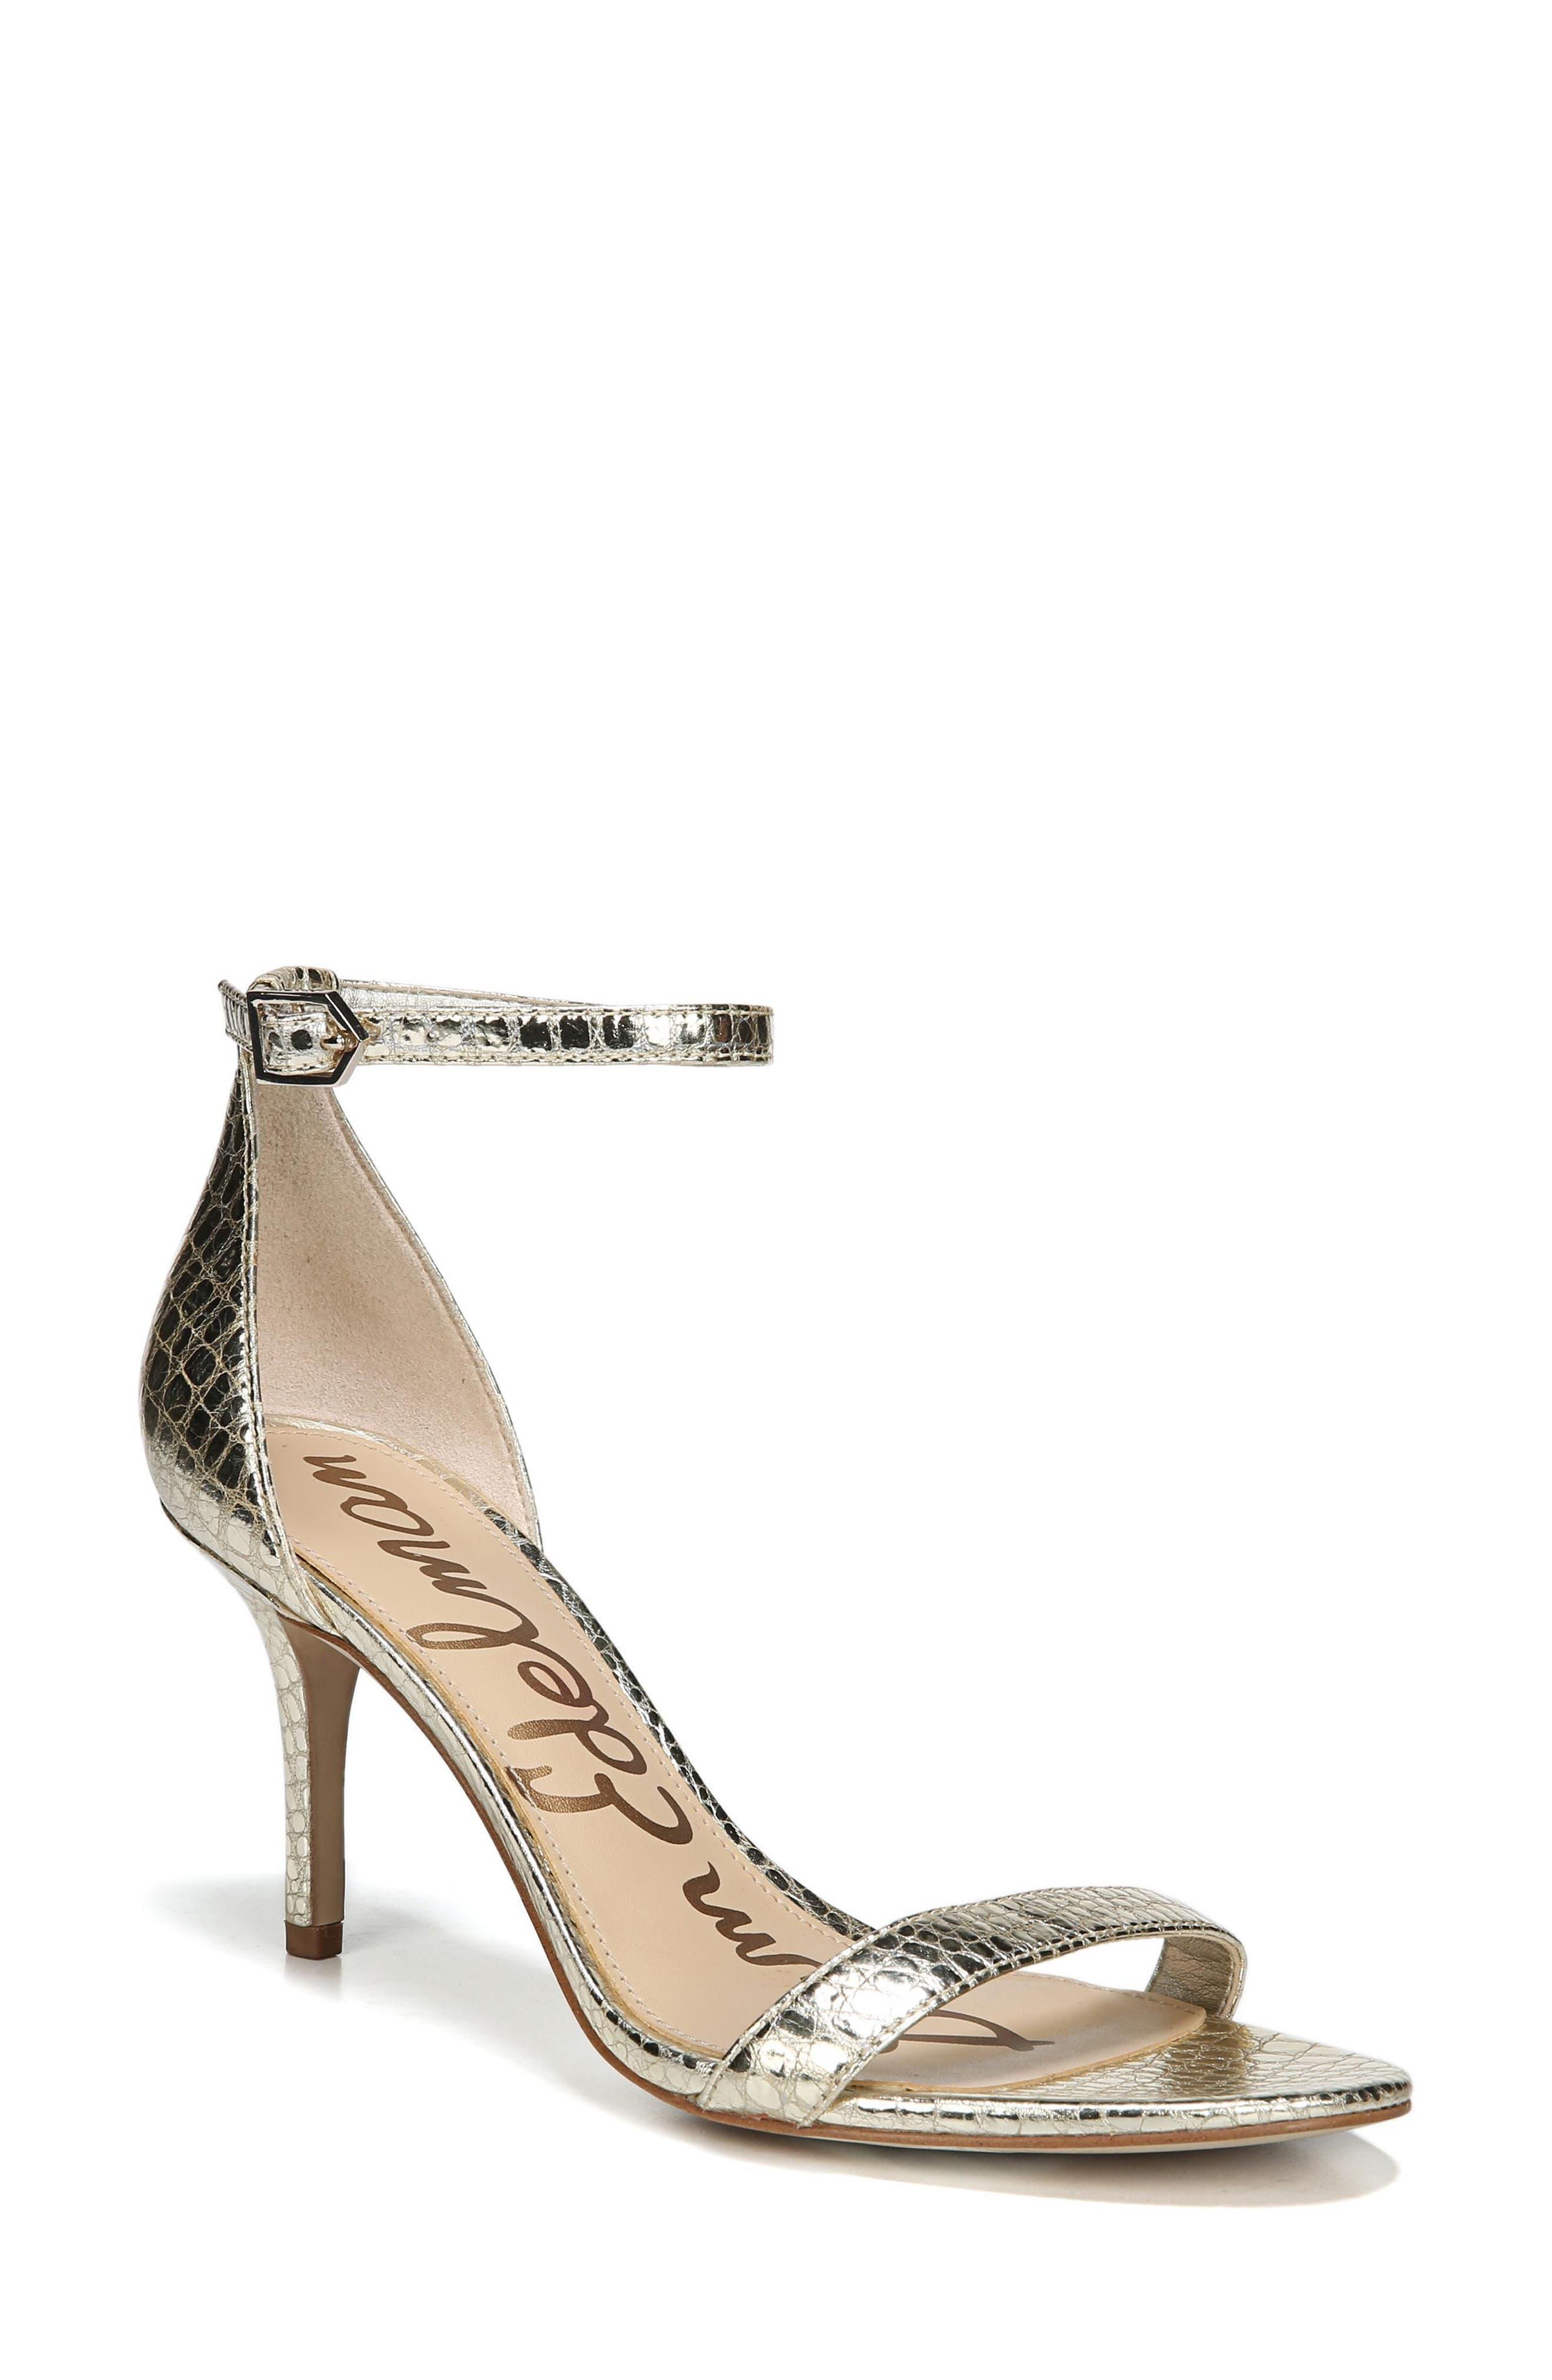 Alternate Image 1 Selected - Sam Edelman 'Patti' Ankle Strap Sandal (Women)